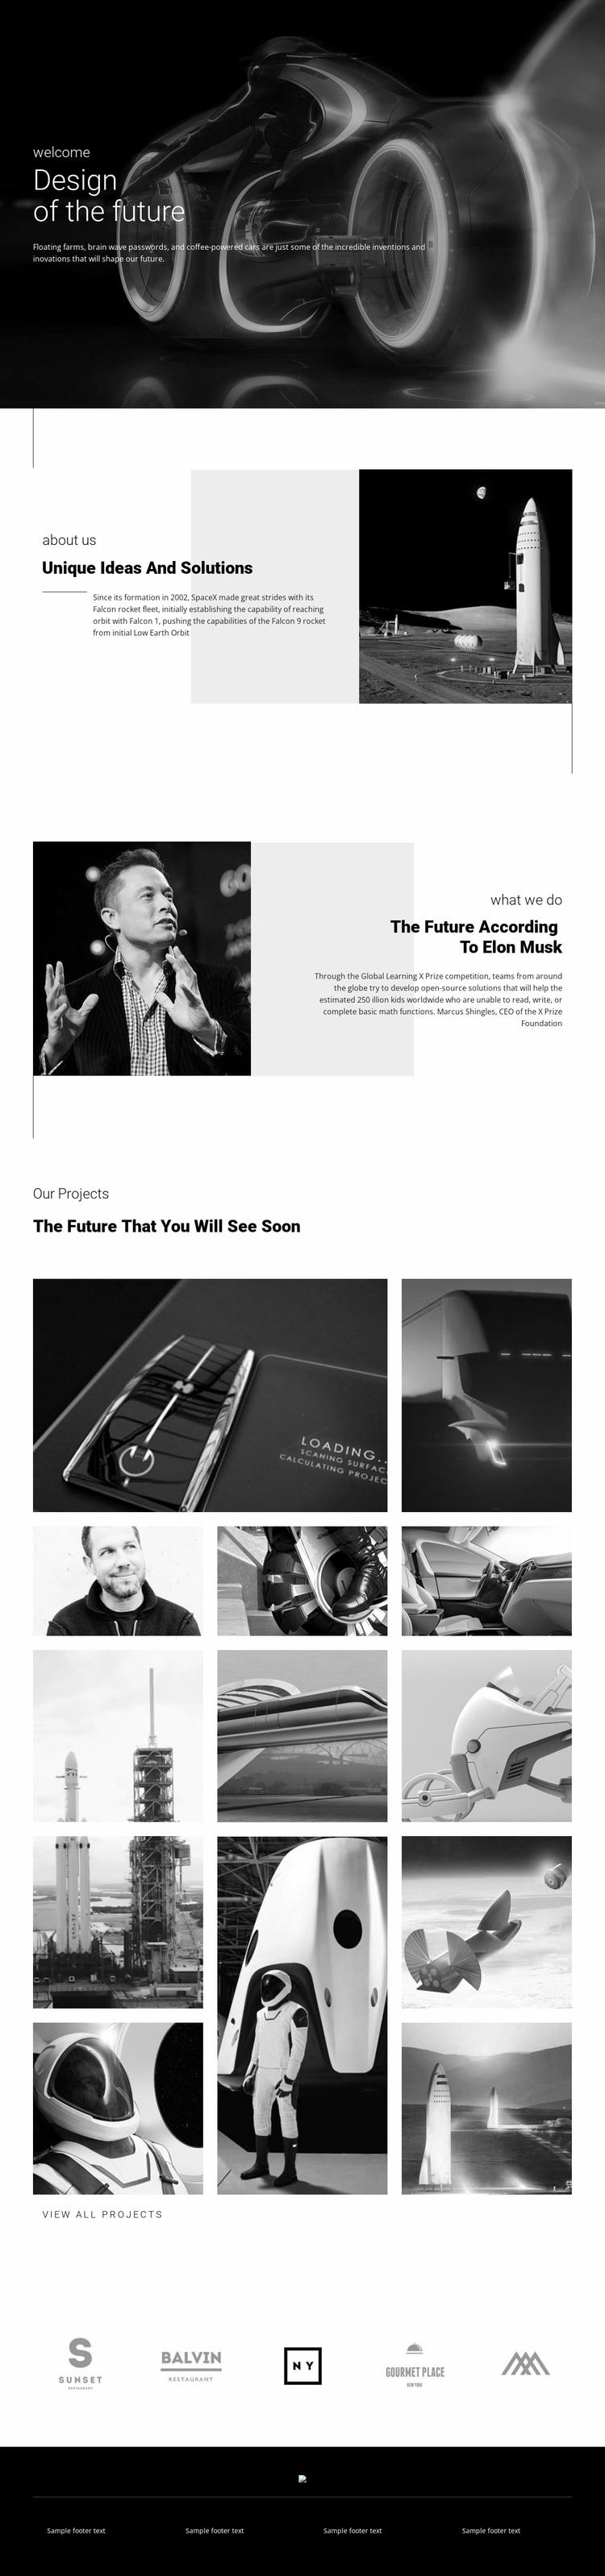 Design of future technology Website Design